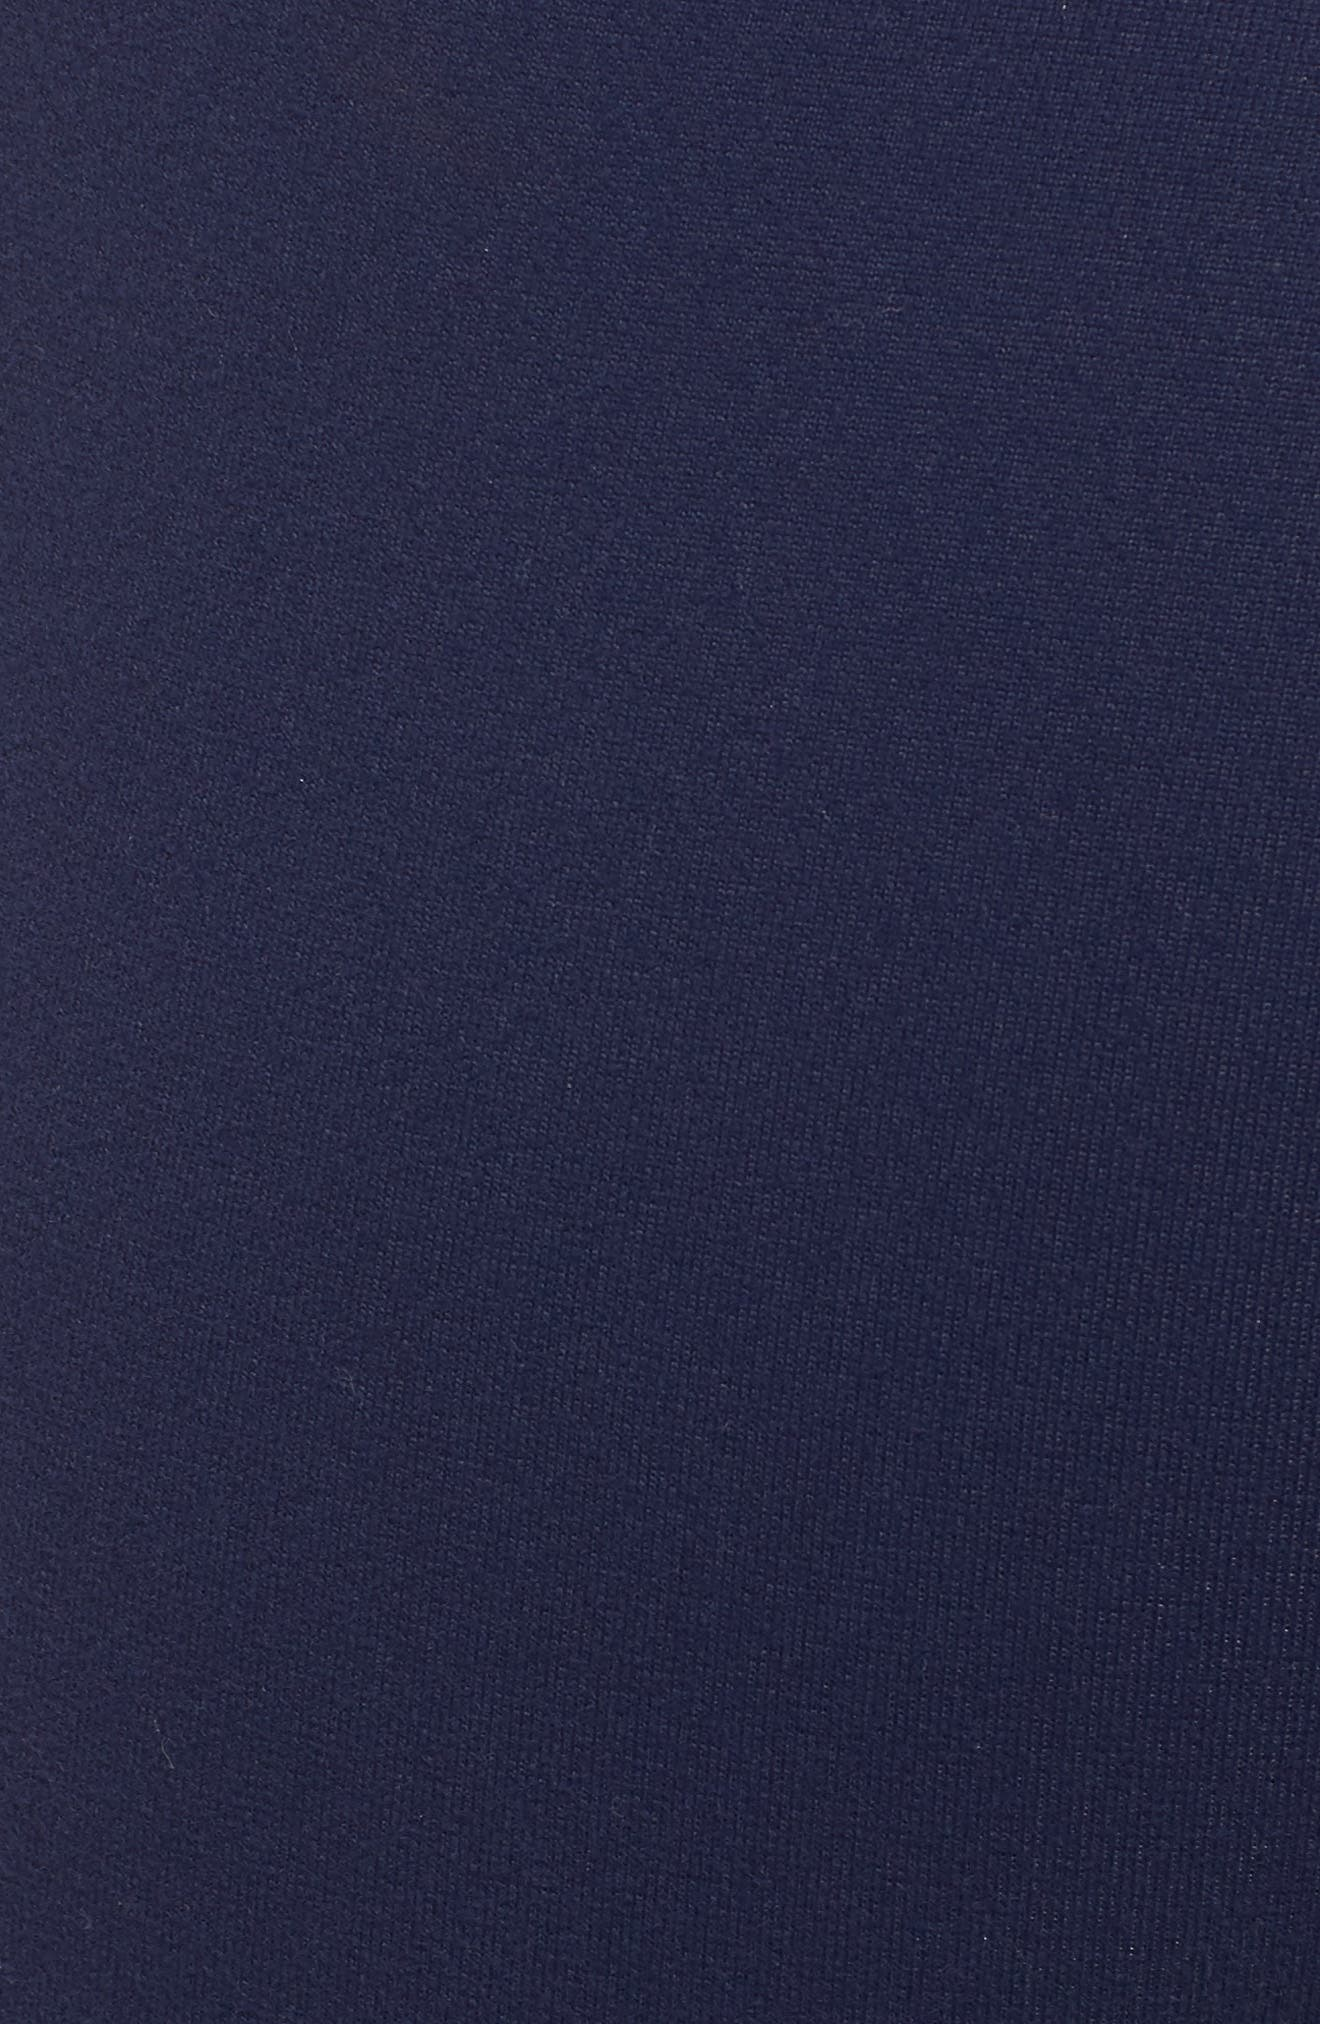 High Waist Capri Leggings,                             Alternate thumbnail 6, color,                             Nightfall